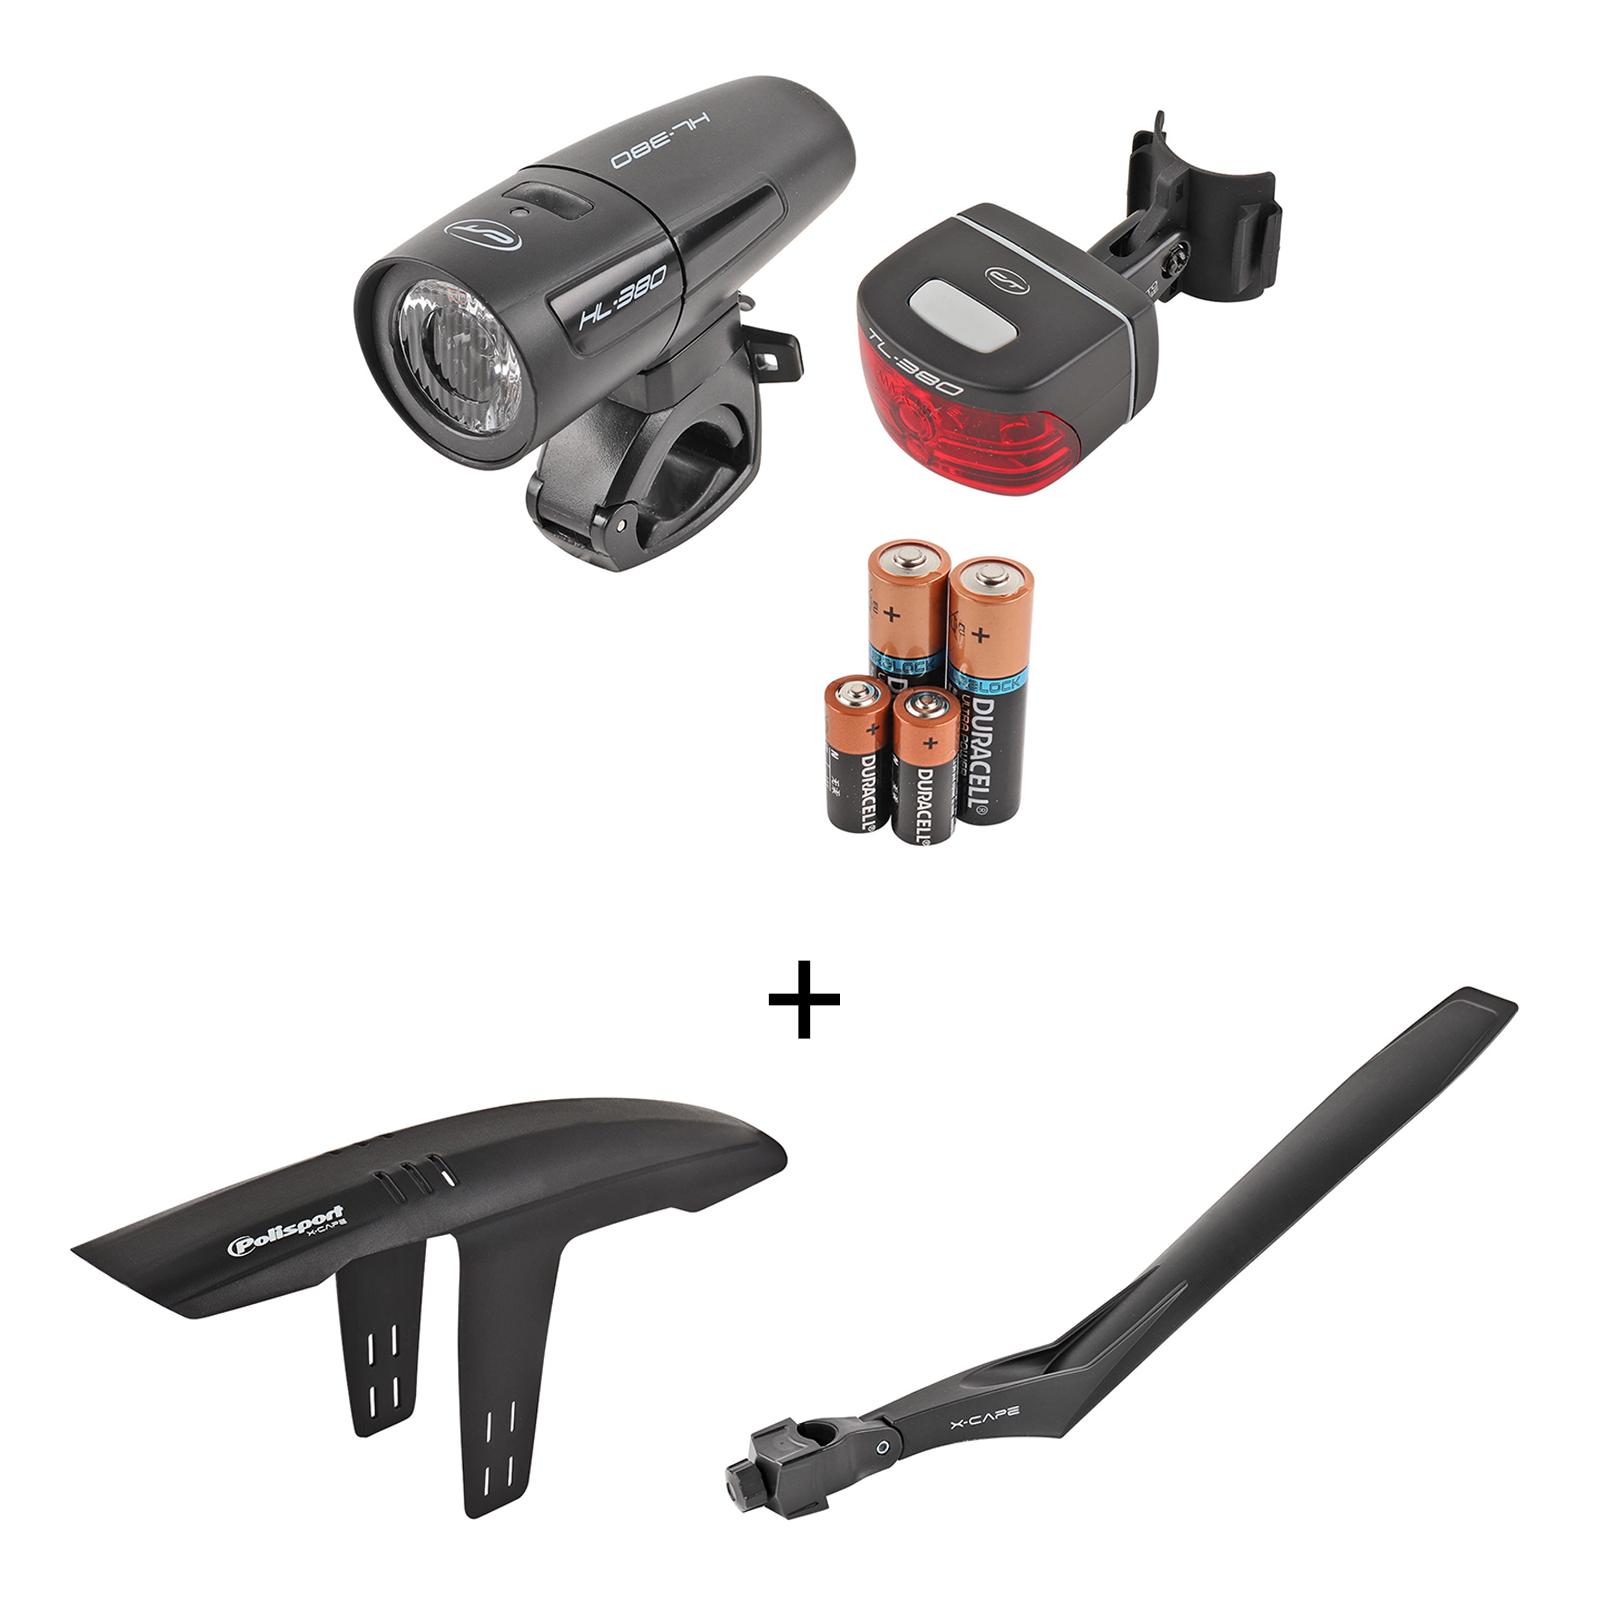 Led Fahrradleuchten-Set CONTEC LS-380 StVZO geprüft inkl. Schutzblech